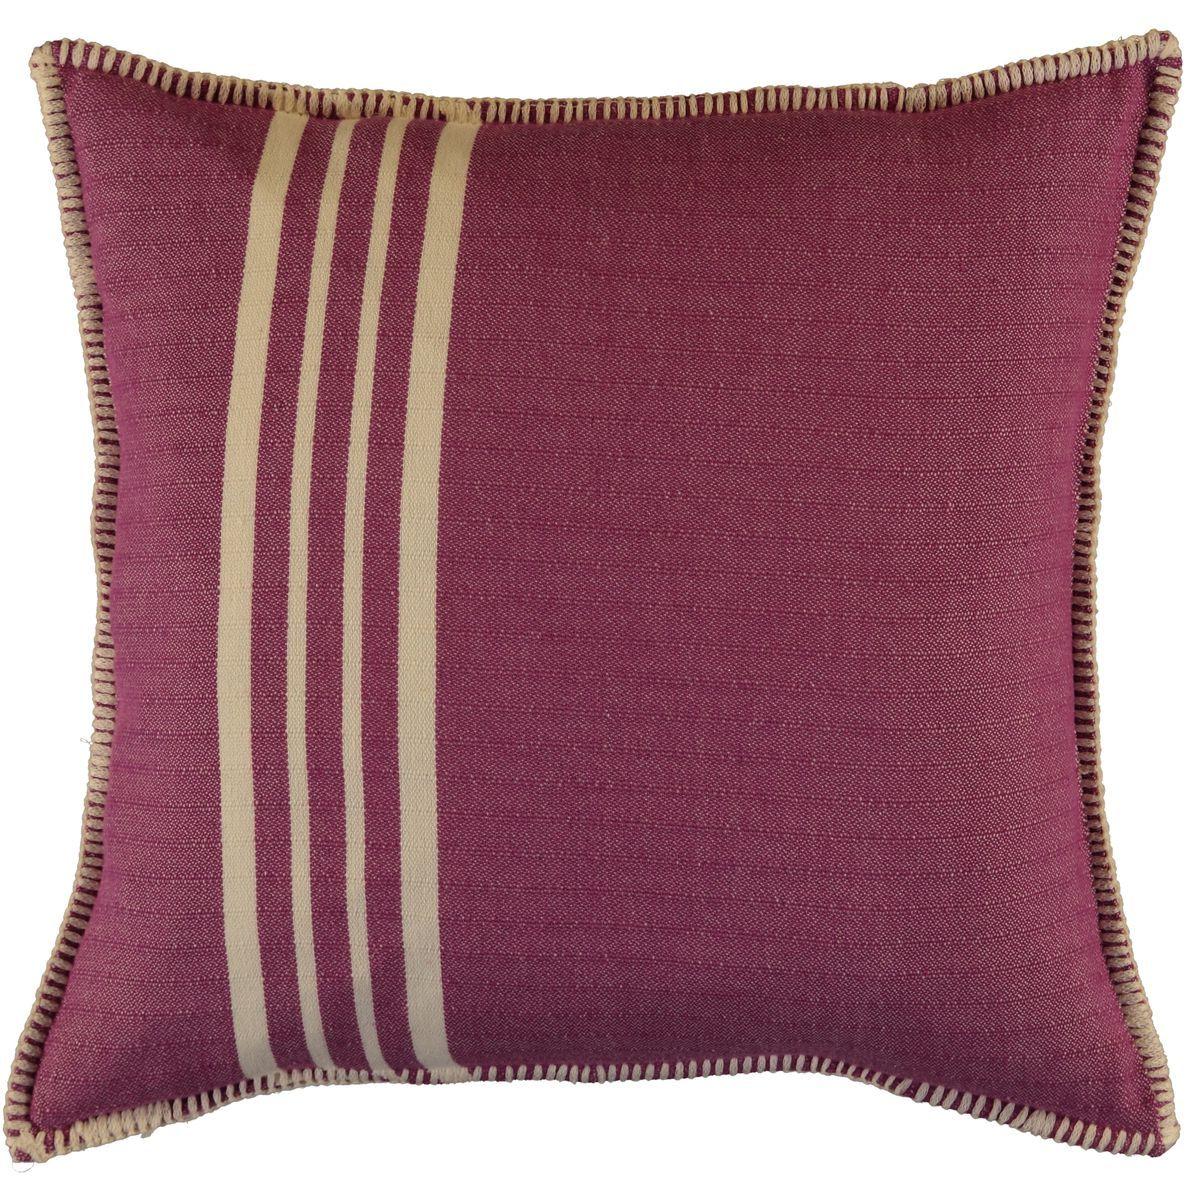 Cushion Cover Sultan - Light Purple / 45x45